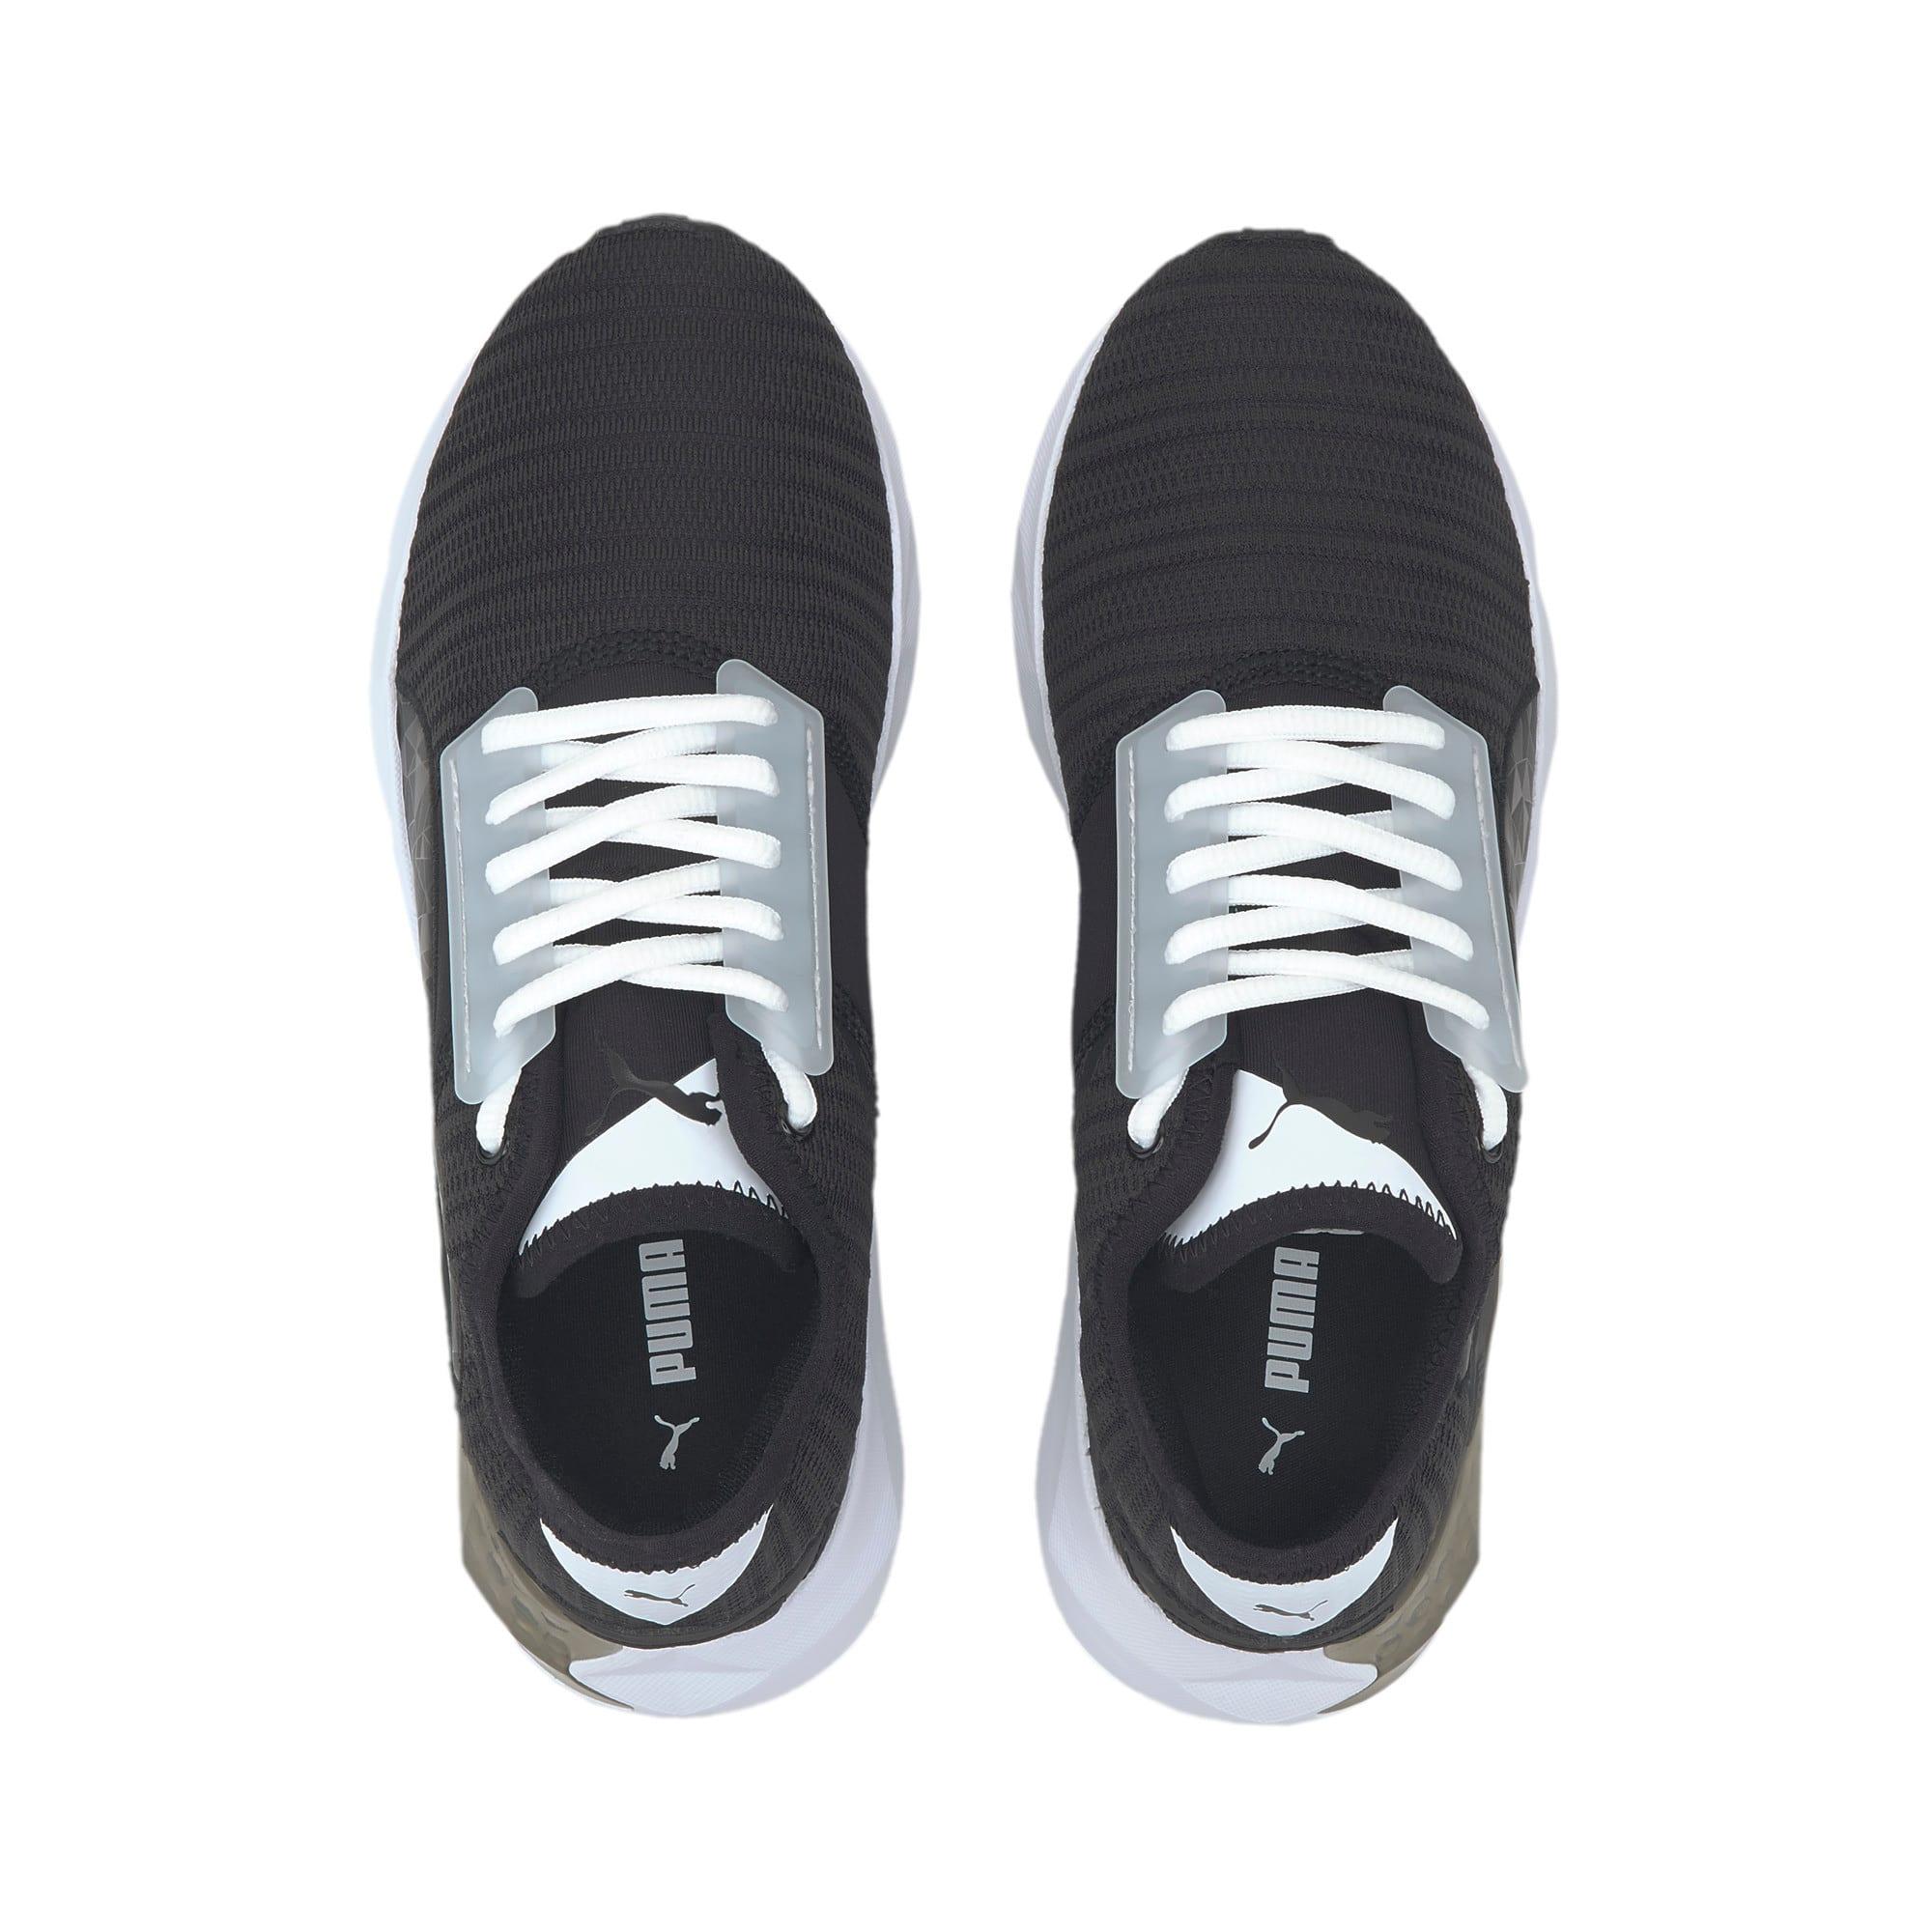 Imagen en miniatura 7 de Zapatillass de mujer CELL Plasmic, Puma Black-Puma White, mediana